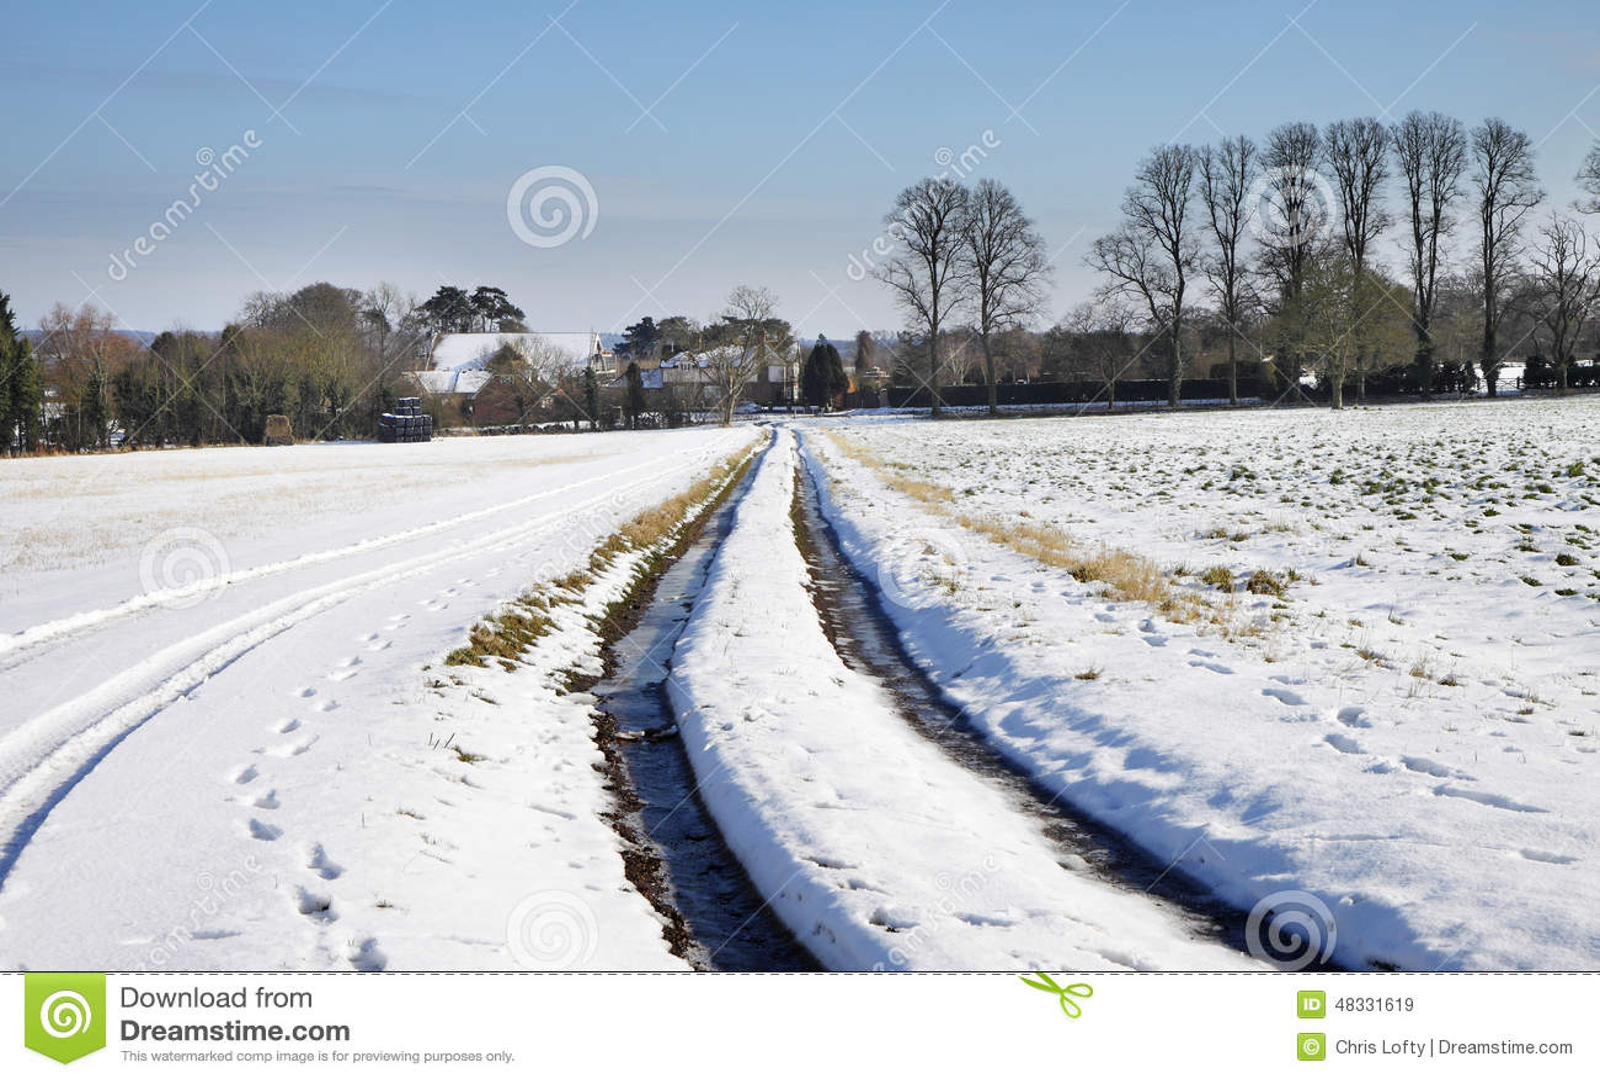 Winter landscape in rural england